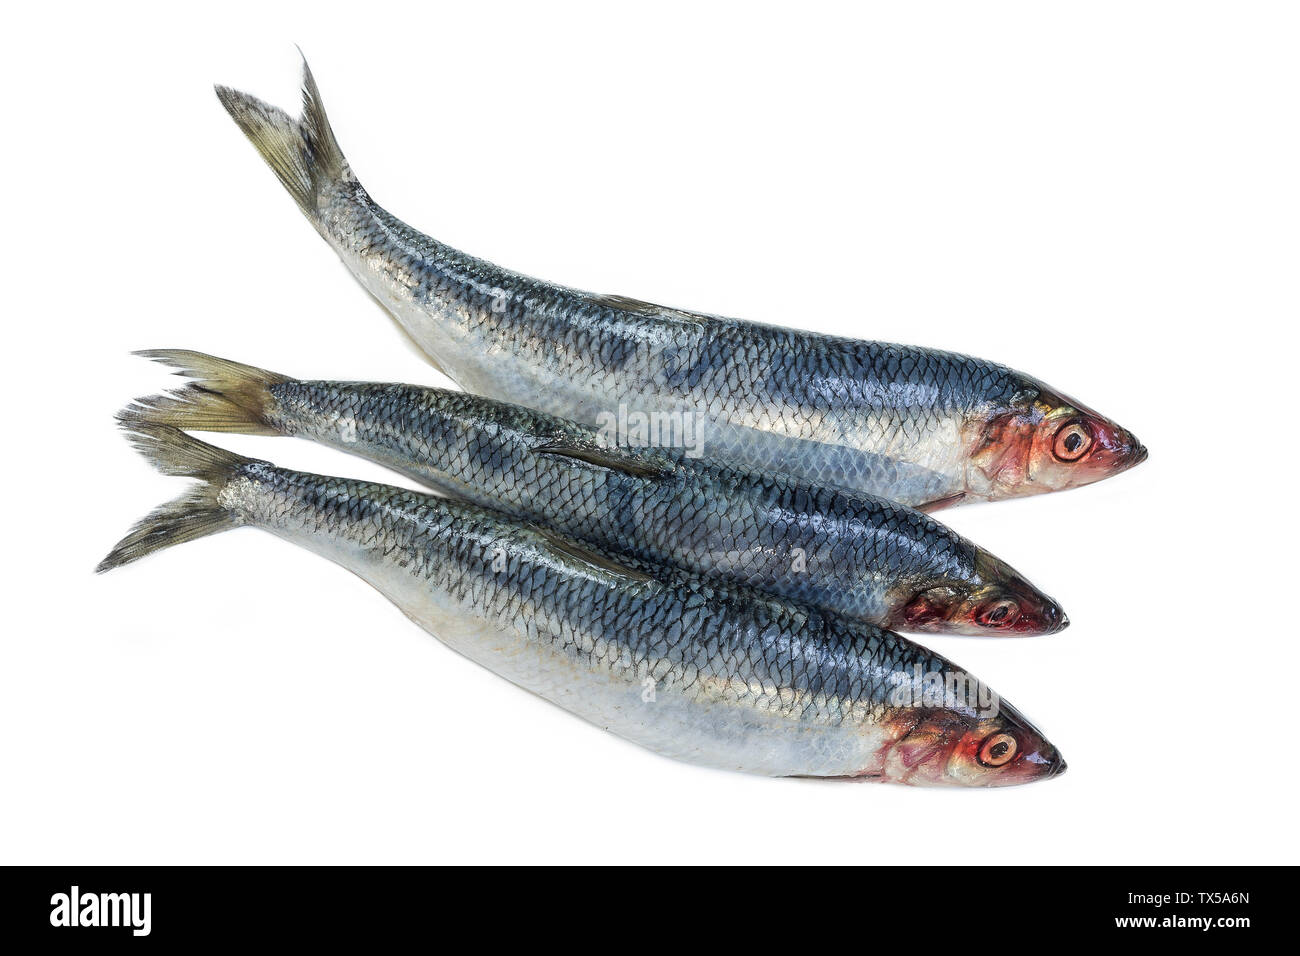 Three Fresh Herring Fish Isolated On White Background Stock